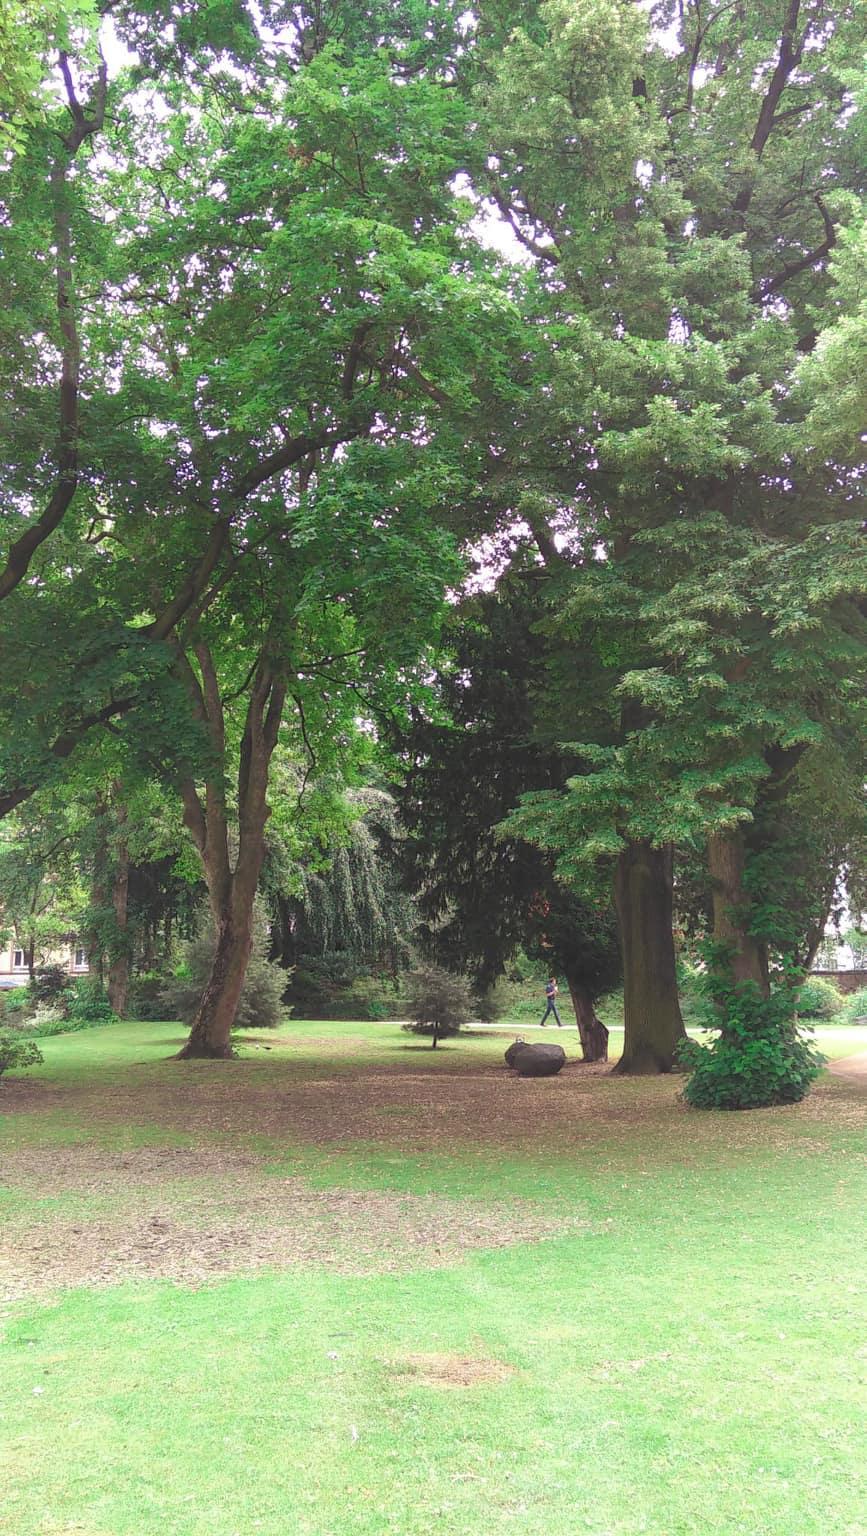 bethmann_park.jpg